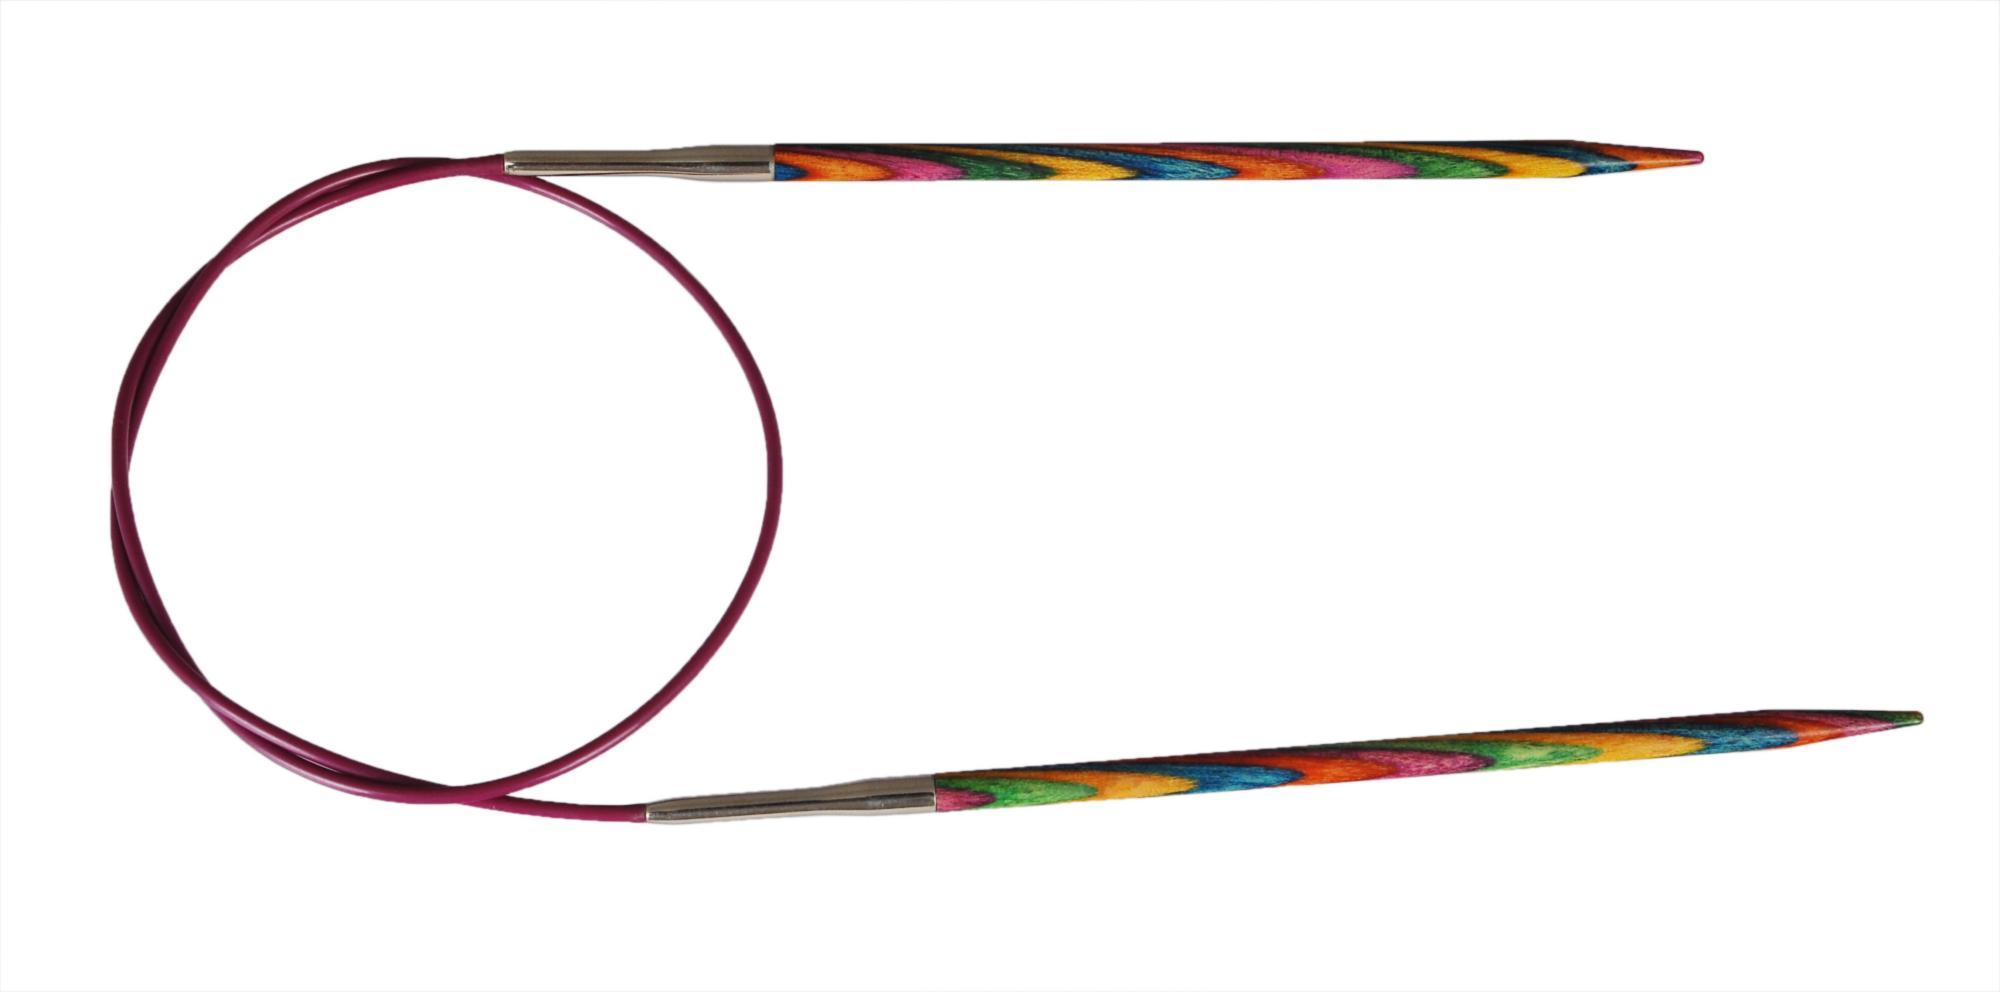 Спицы круговые 80 см Symfonie Wood KnitPro, 21337, 4.00 мм